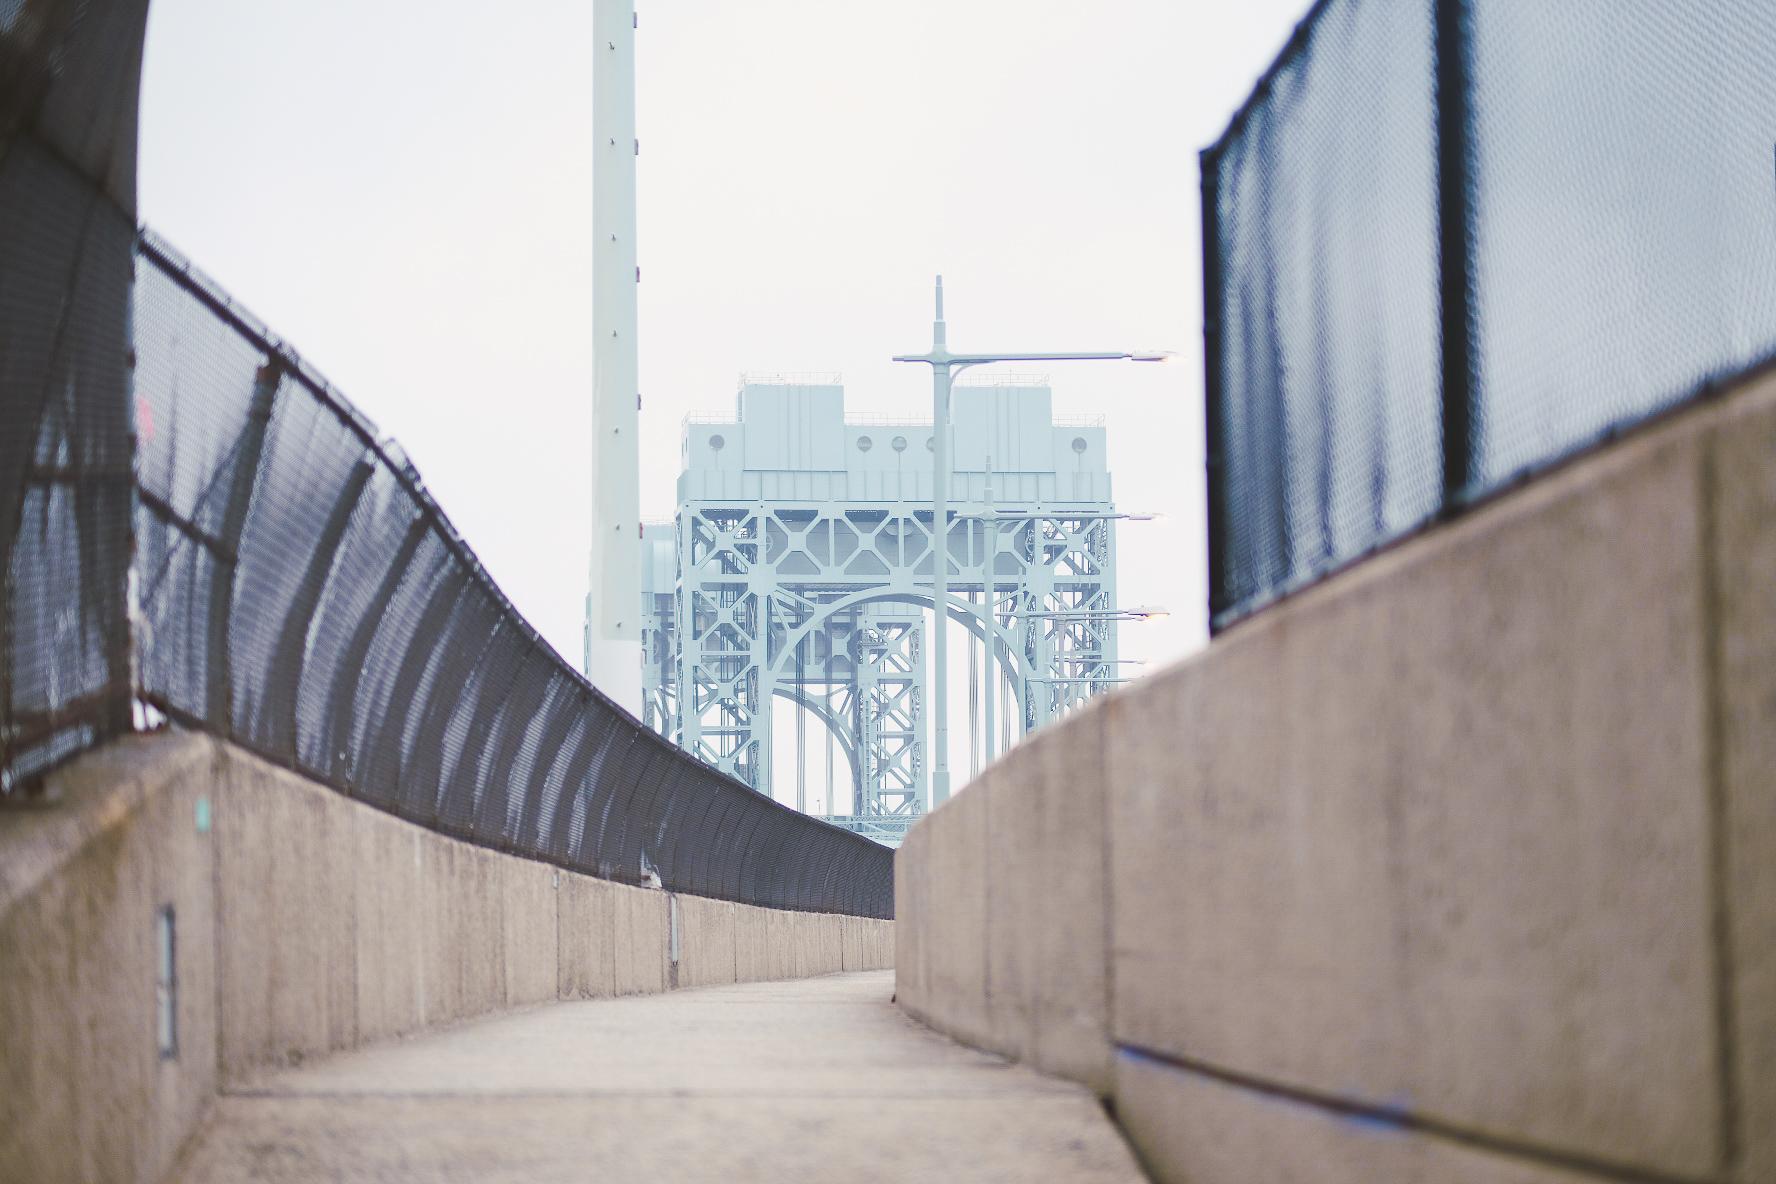 Bridge walk back into the city